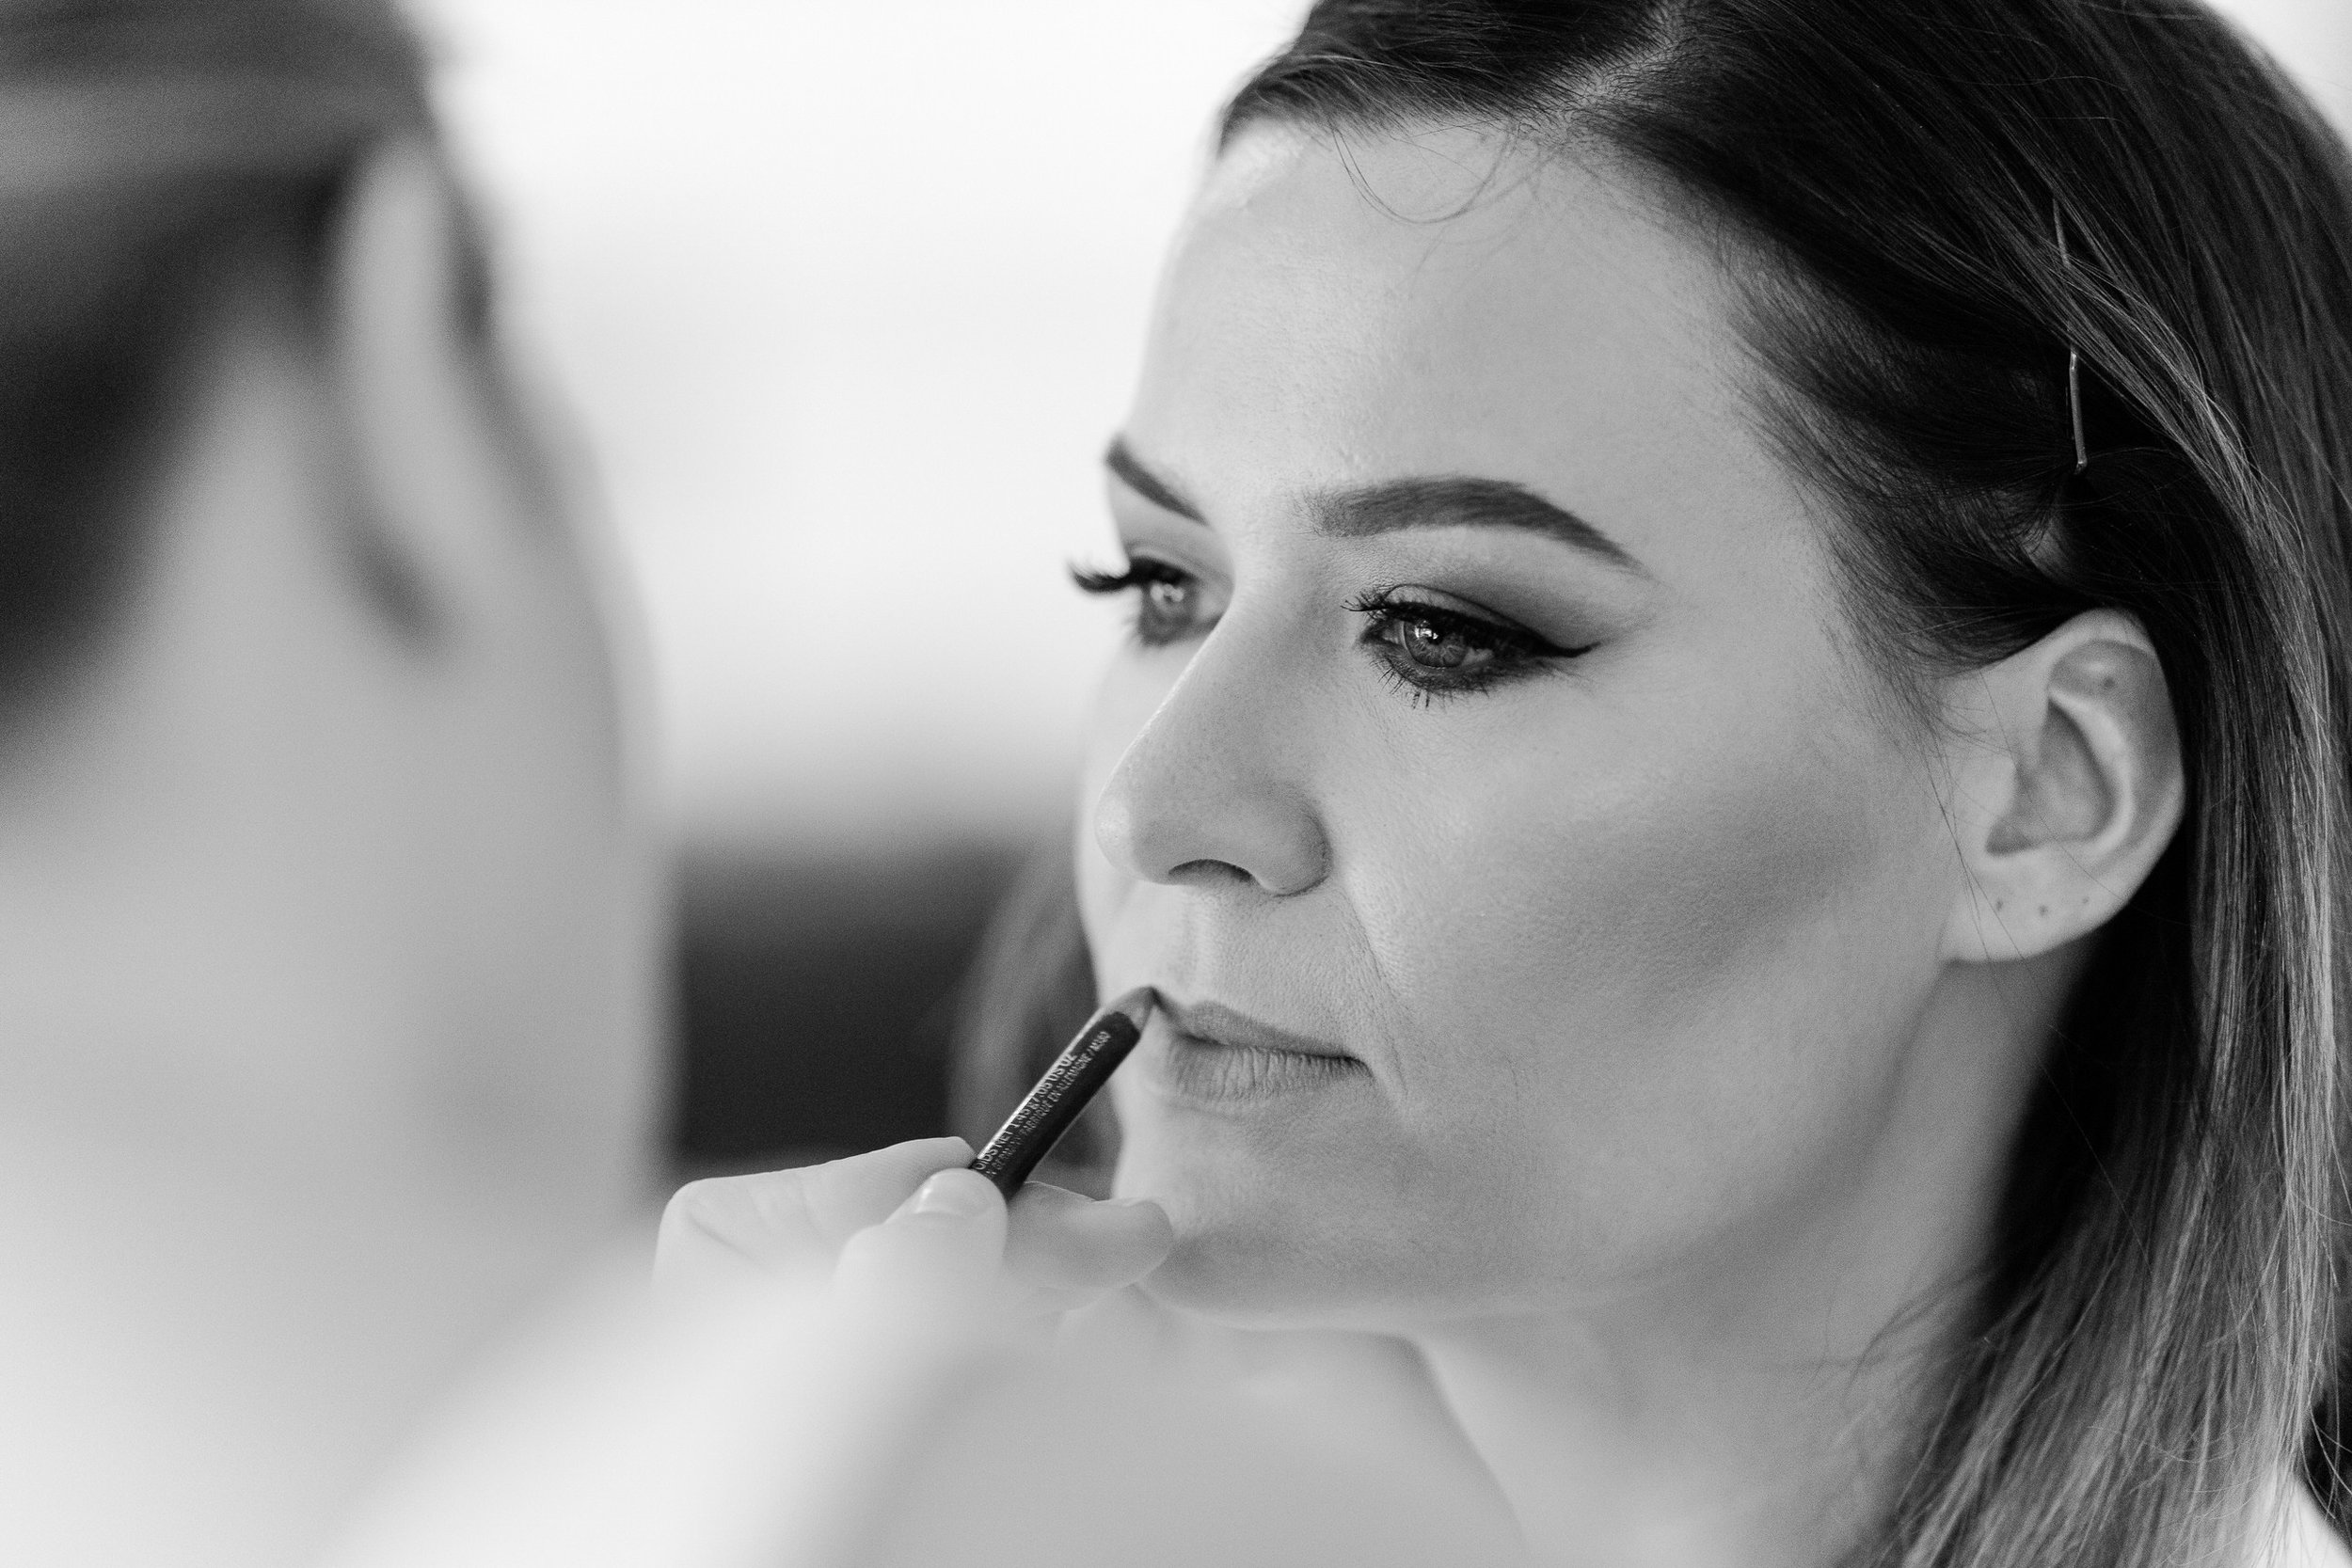 Justin_And_Jim_Photography_Chateau_Dore_Bendigo_Wedding3.JPG